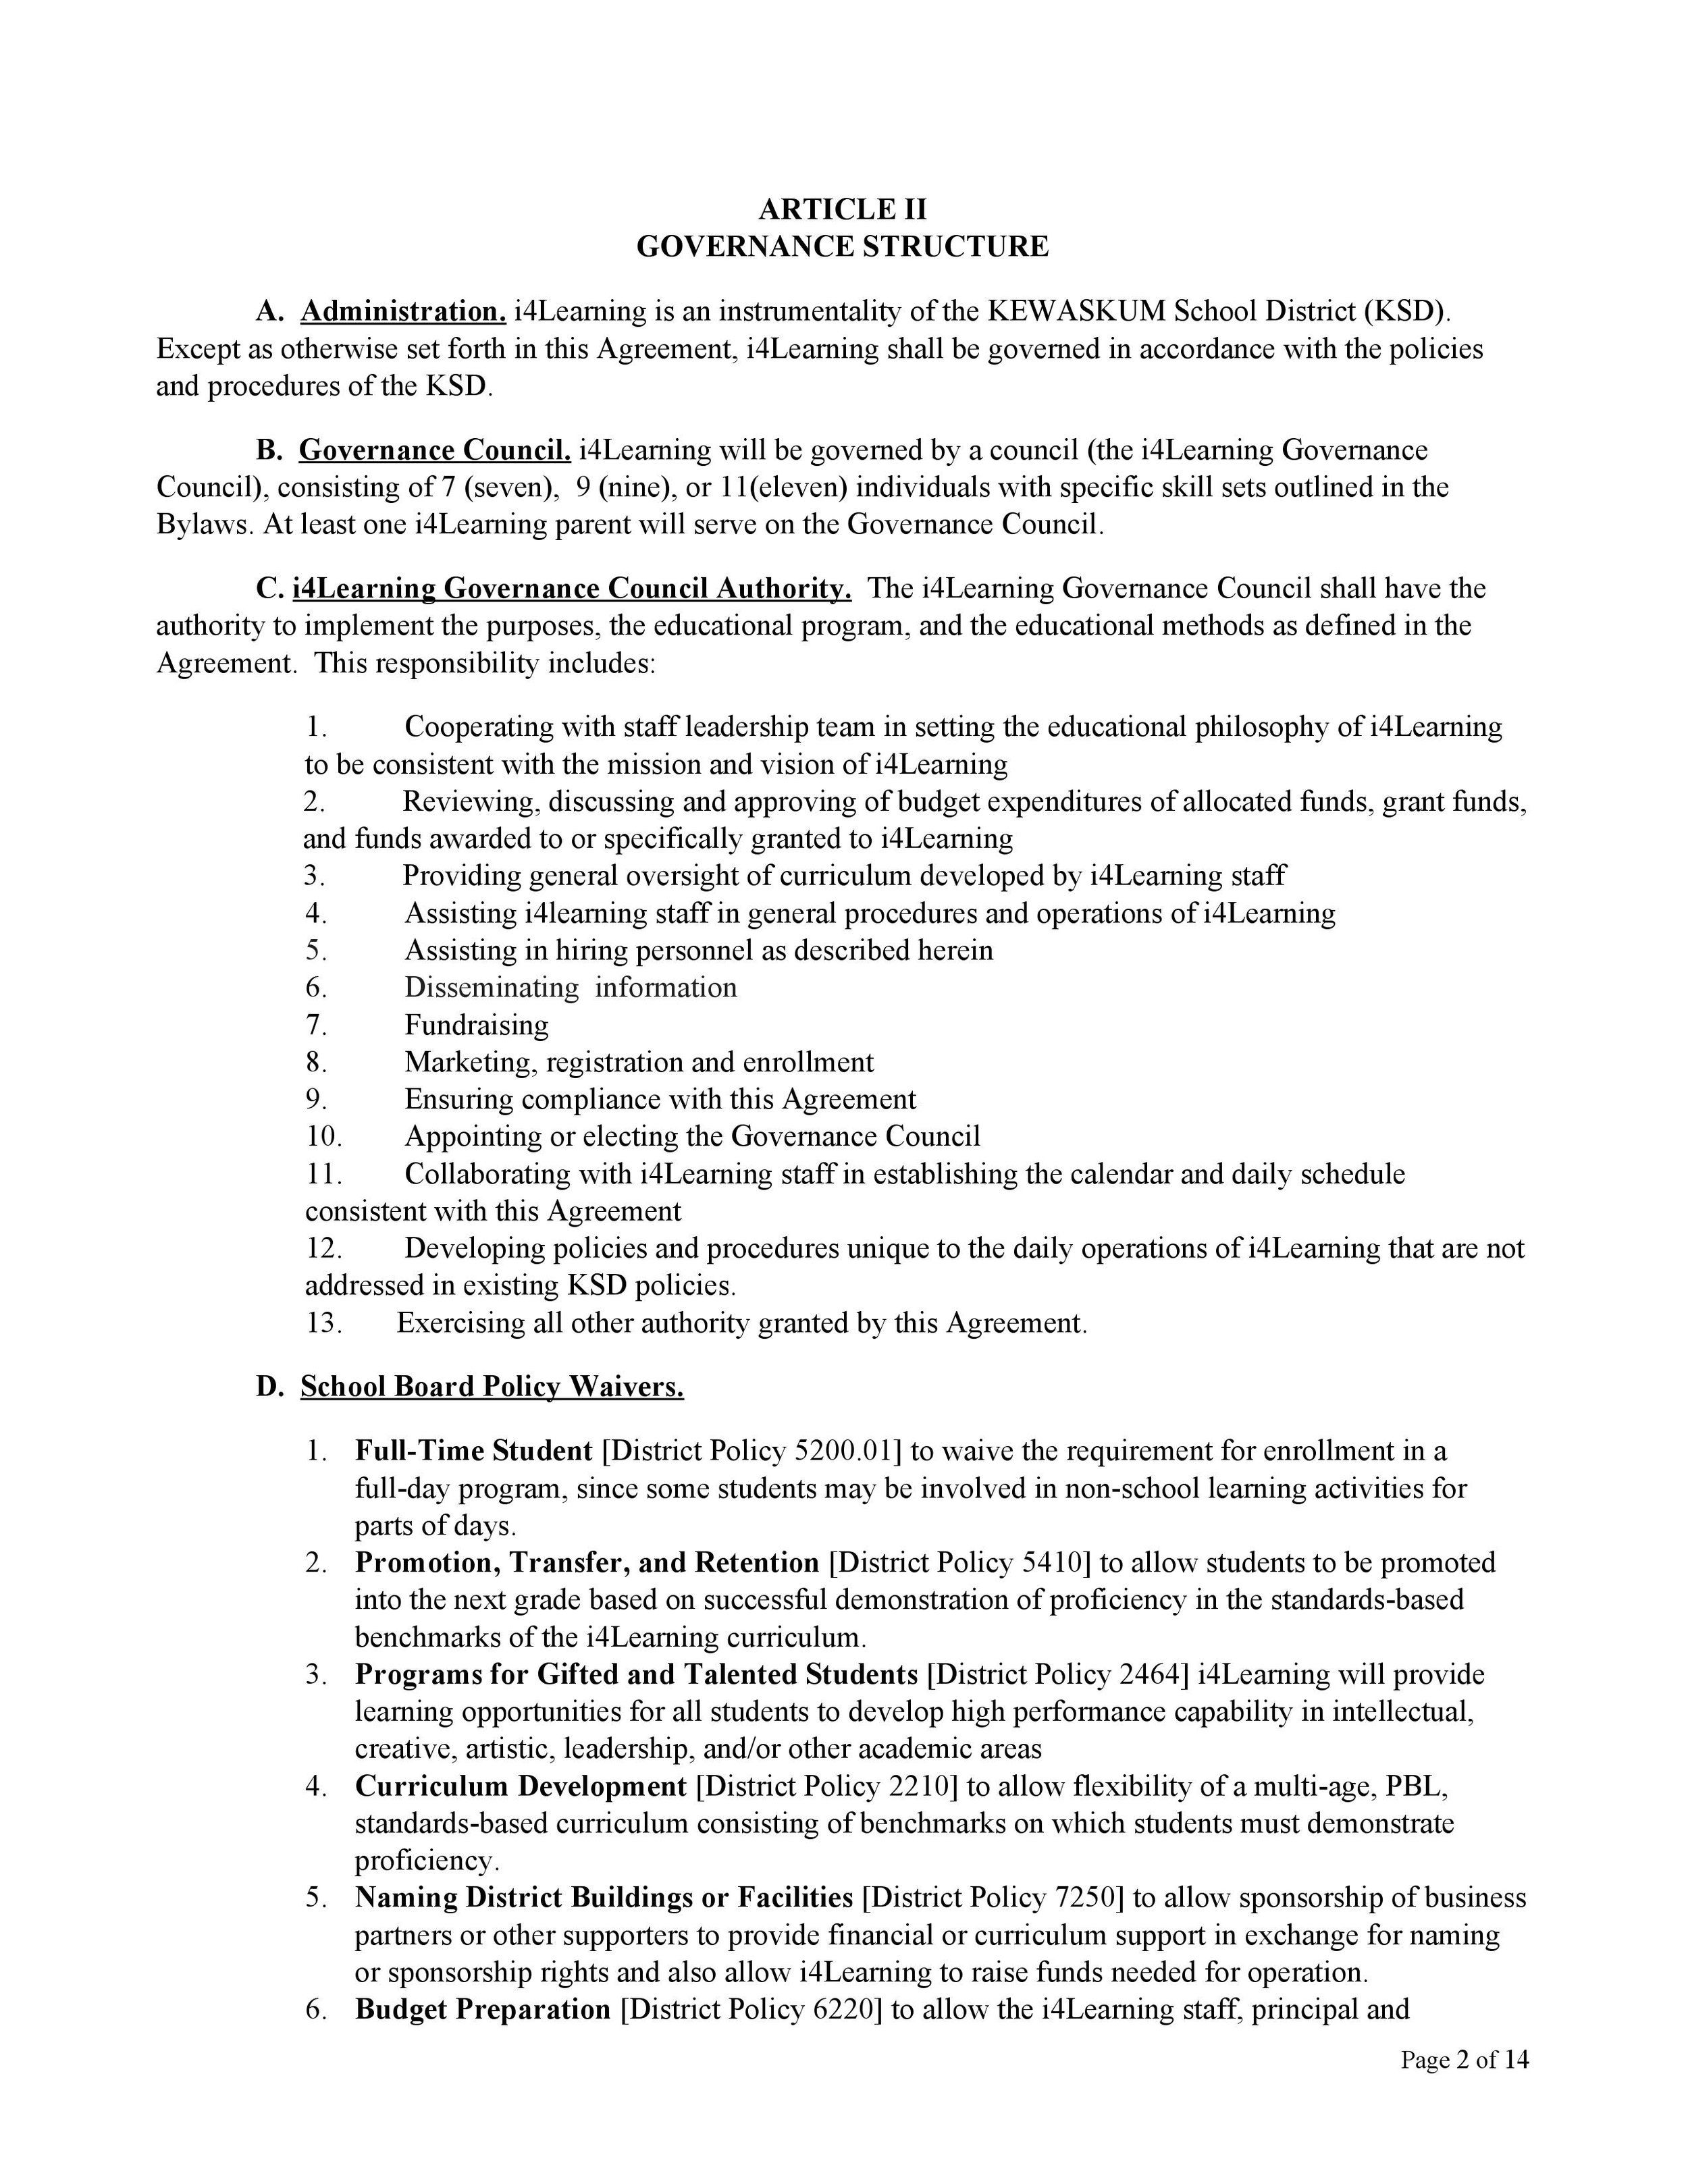 Contract pg 2.jpg